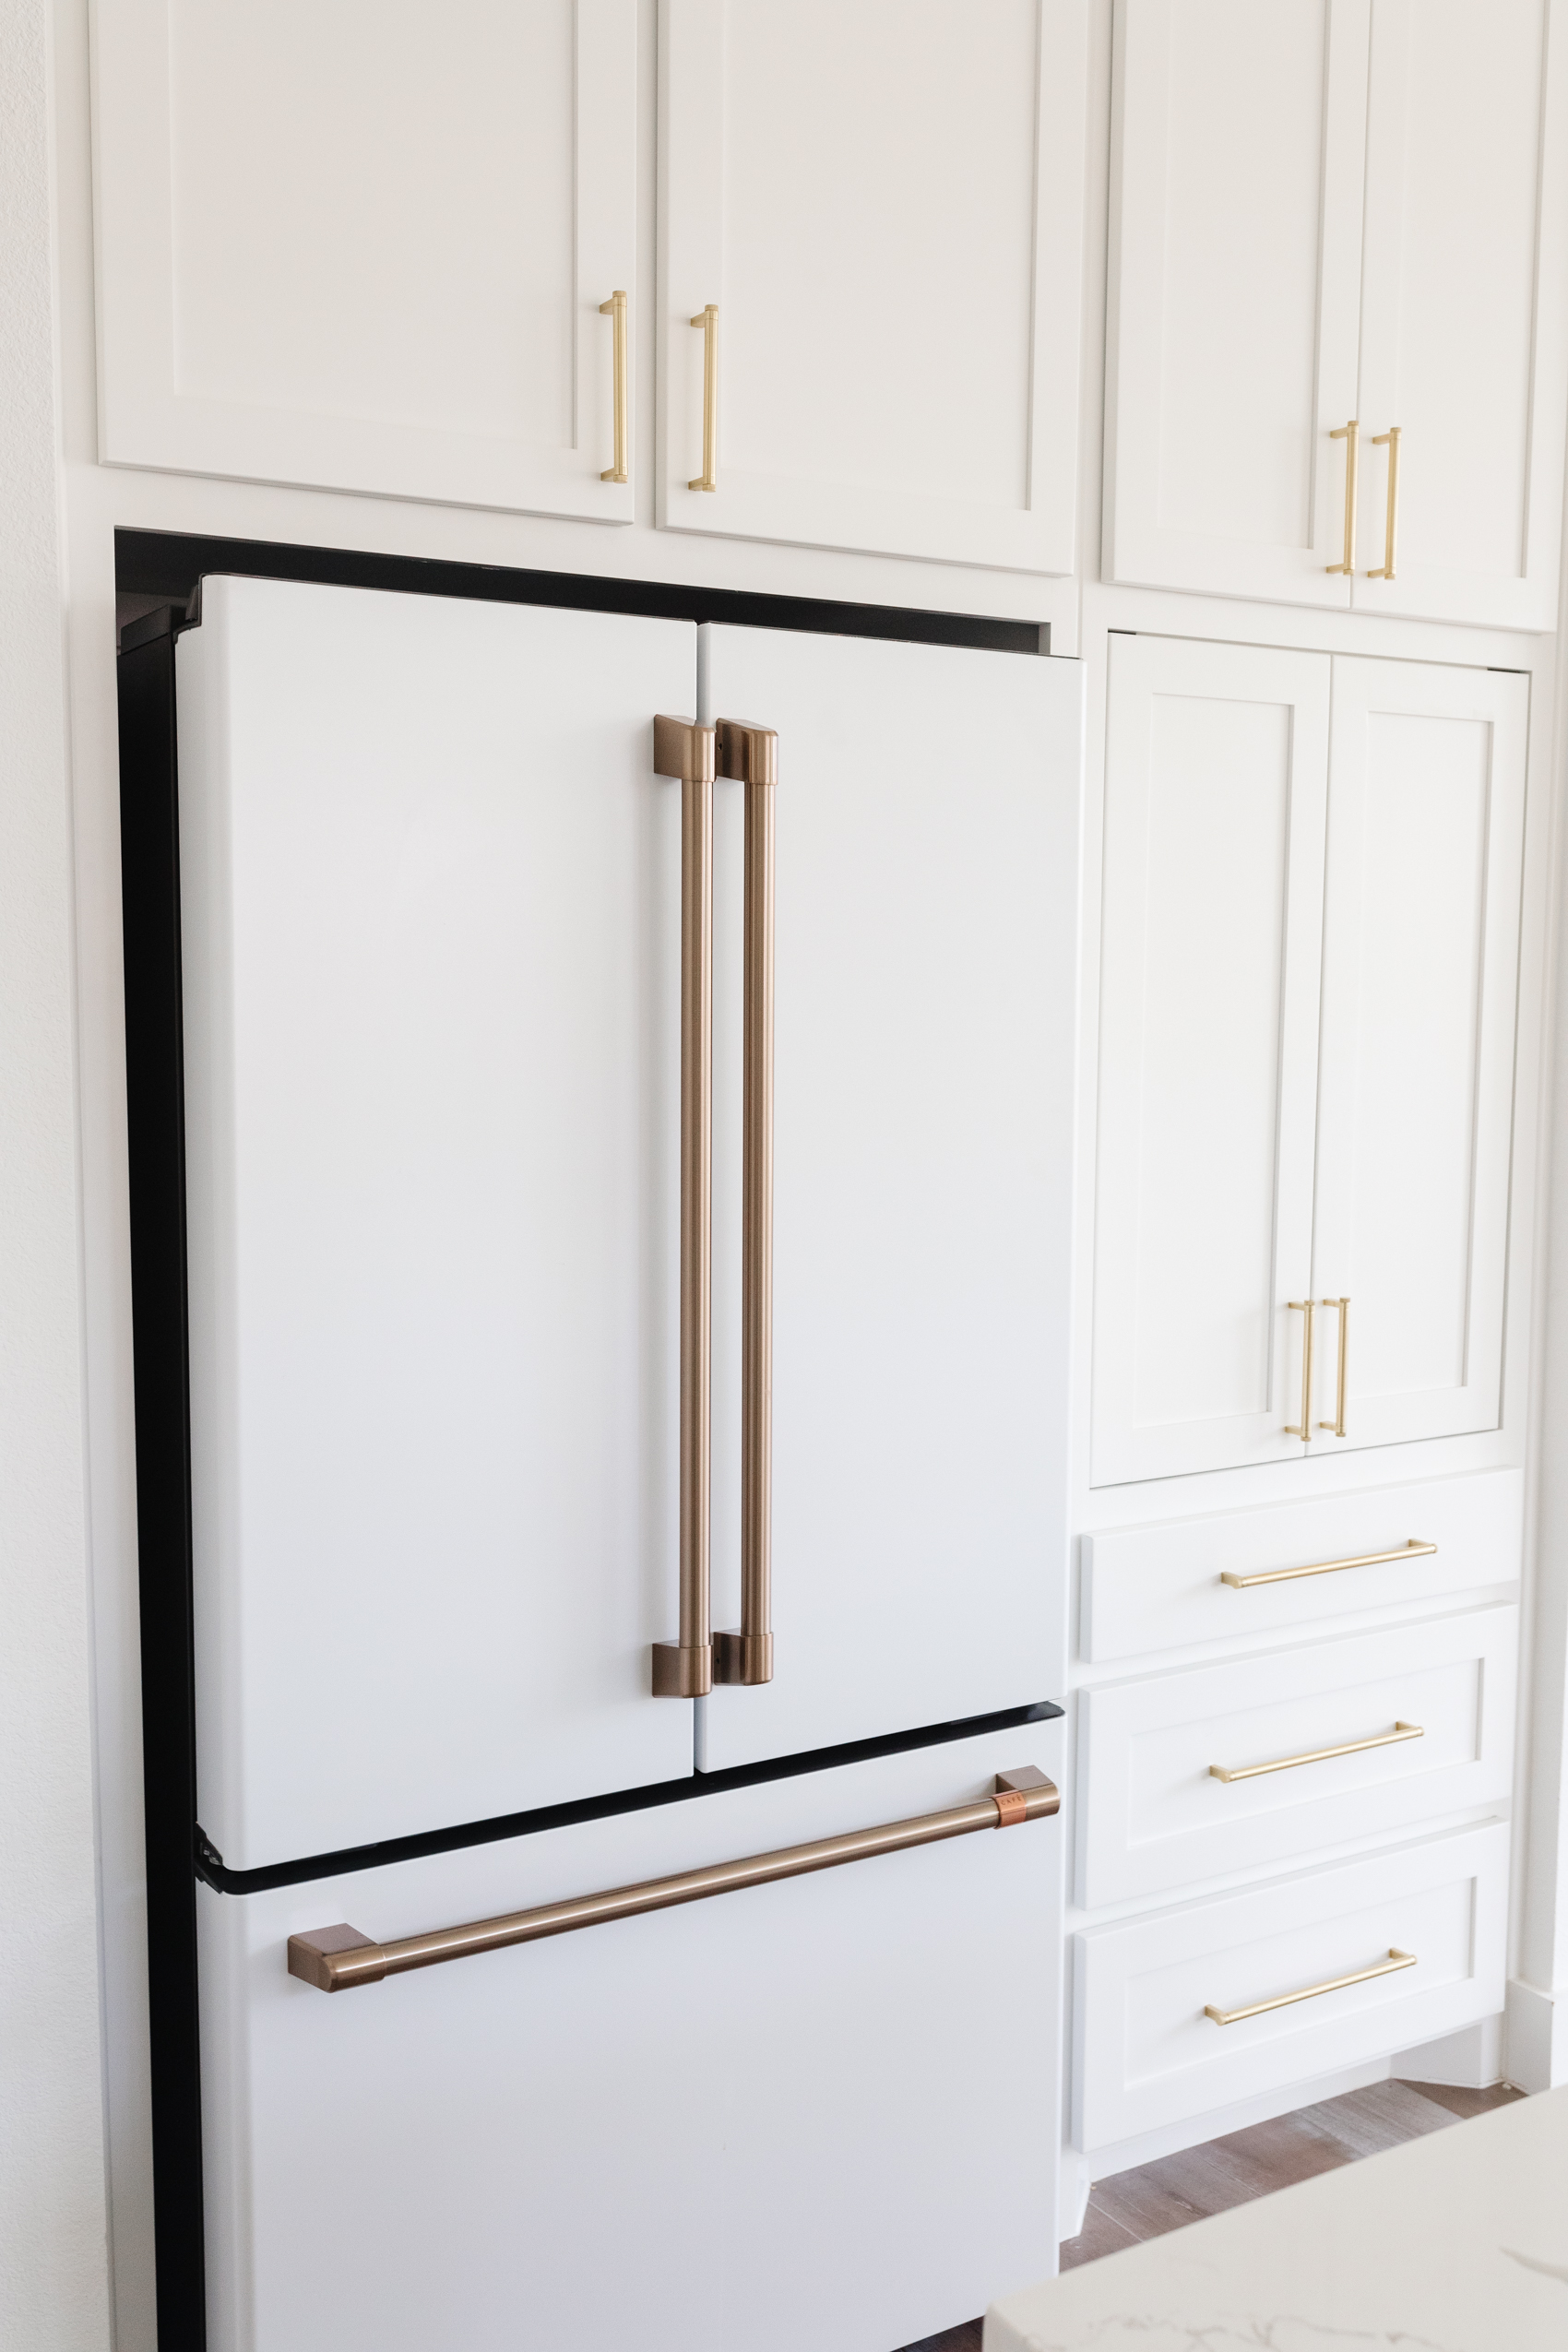 luxury ge cafe appliances refrigerator